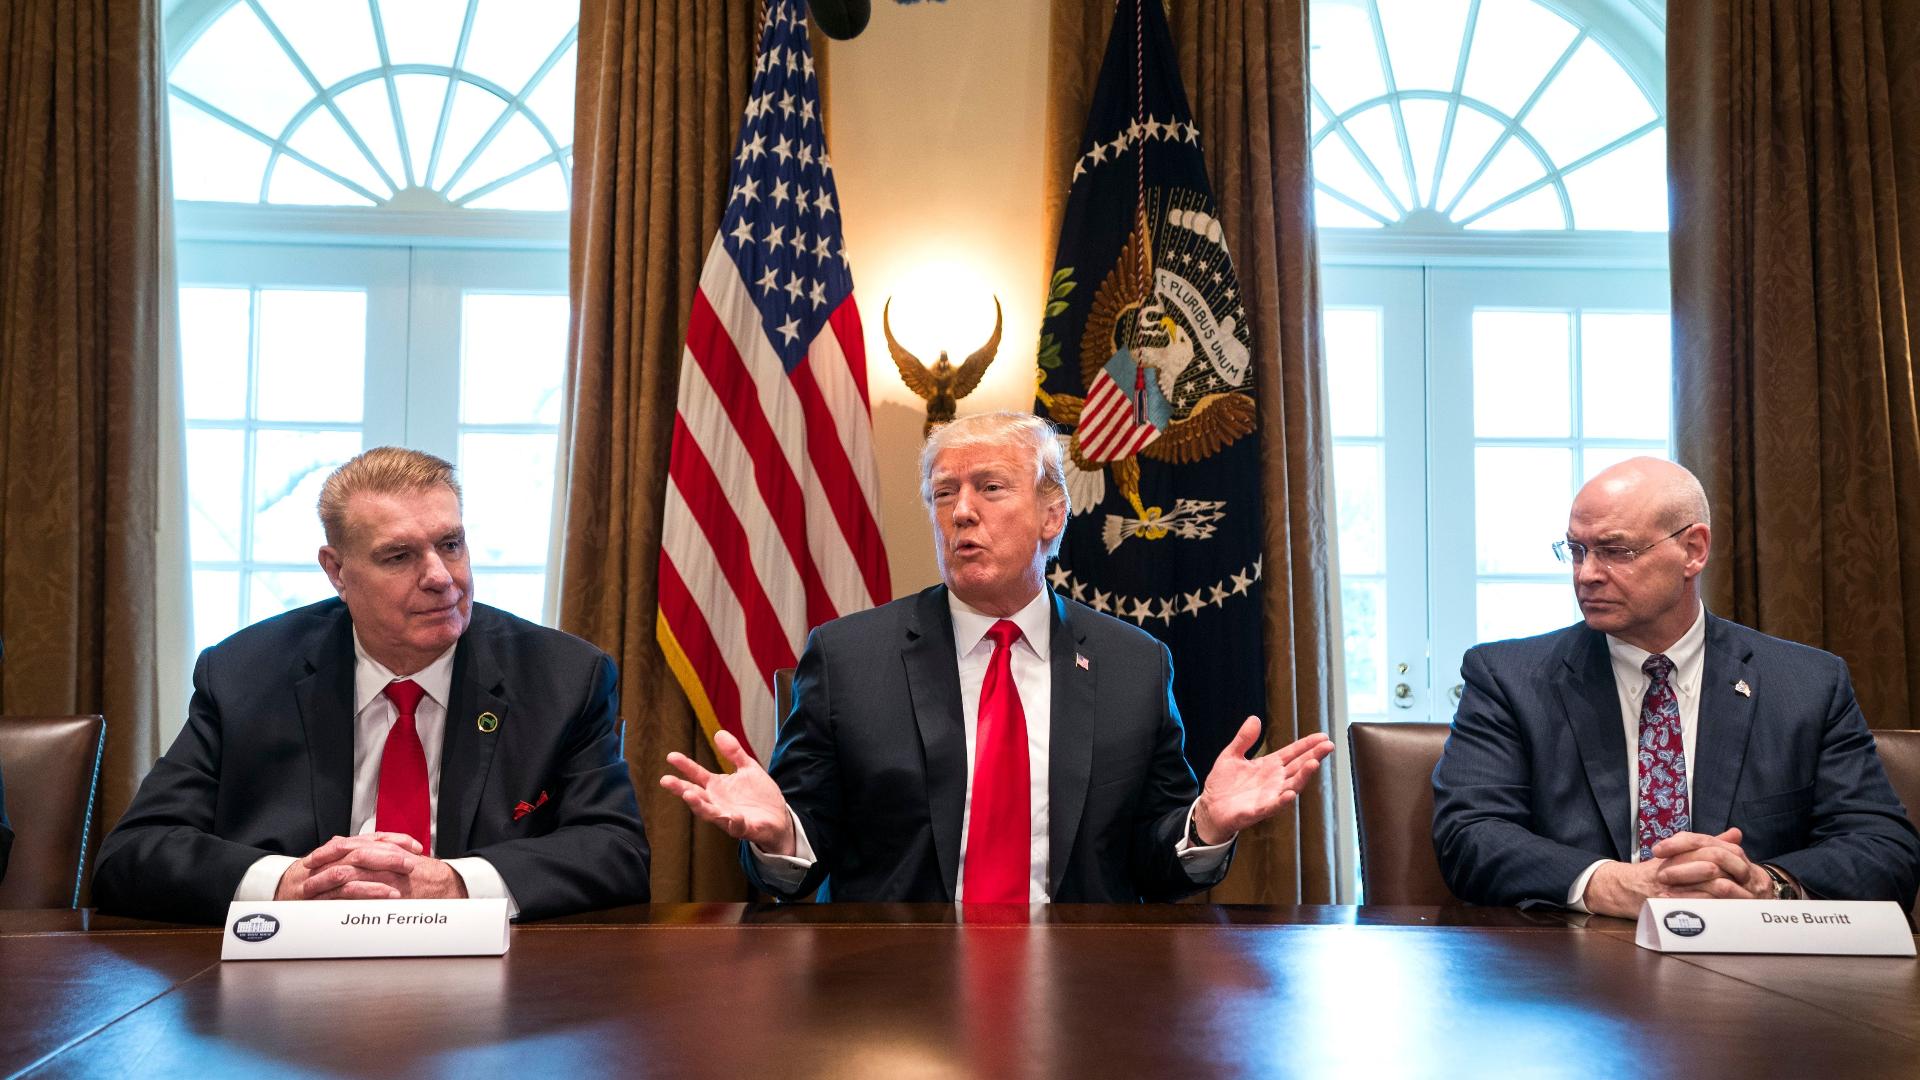 'Declaration of war': European officials offer brutal responses to Trump tariffs